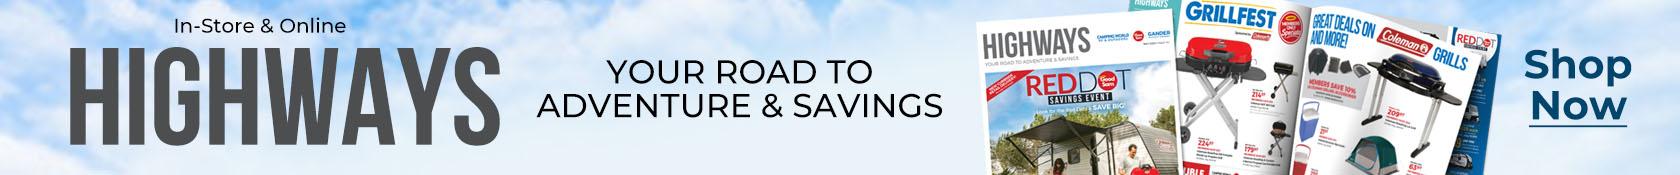 Highways - Your road to adventure & savings